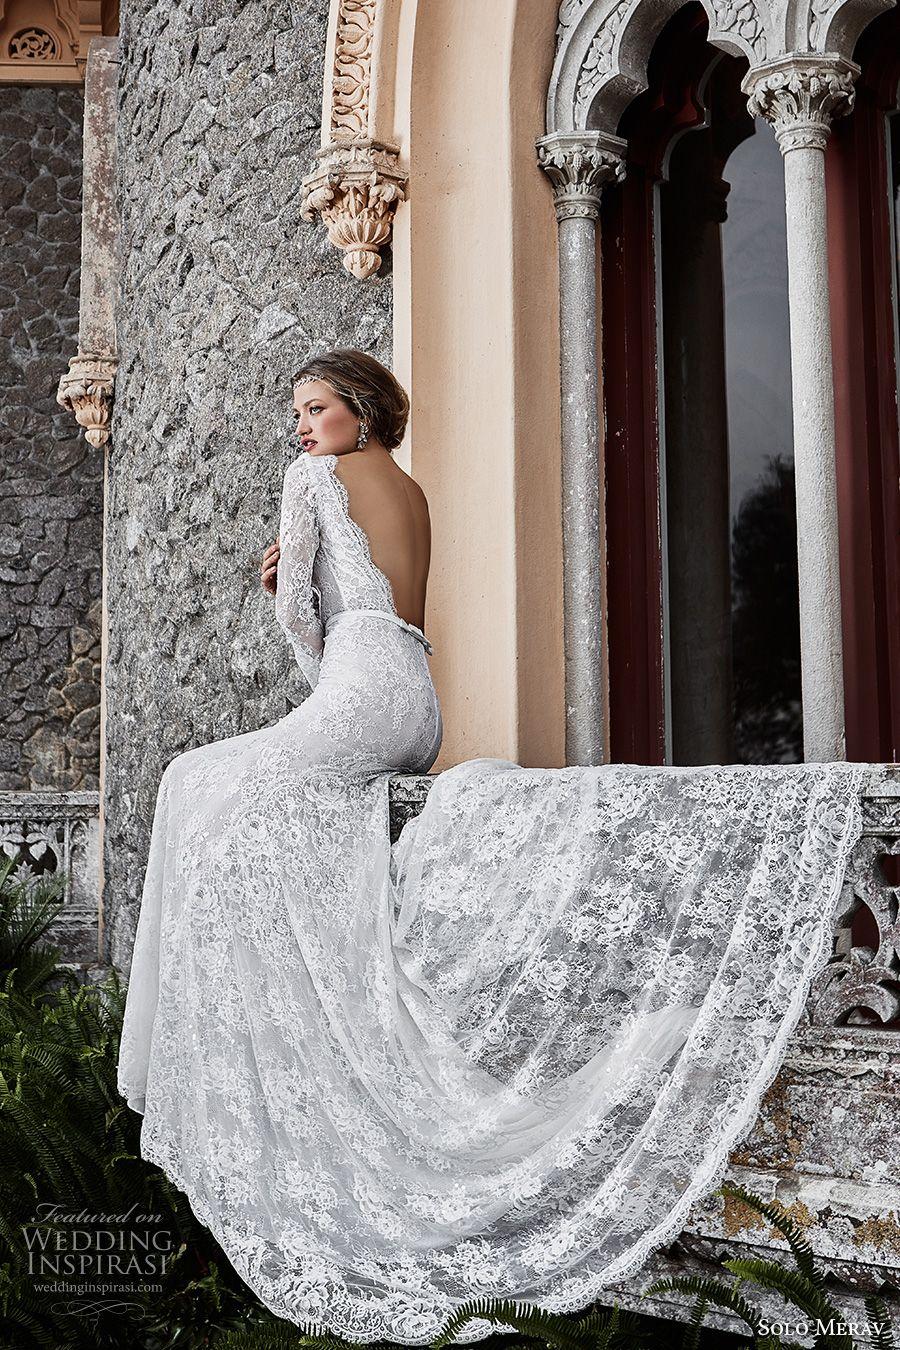 869a20c24 solo merav 2017 bridal long sleeves bateau neckline full embellishment  elegant sheath wedding dress low back chapel train (victoria) bv